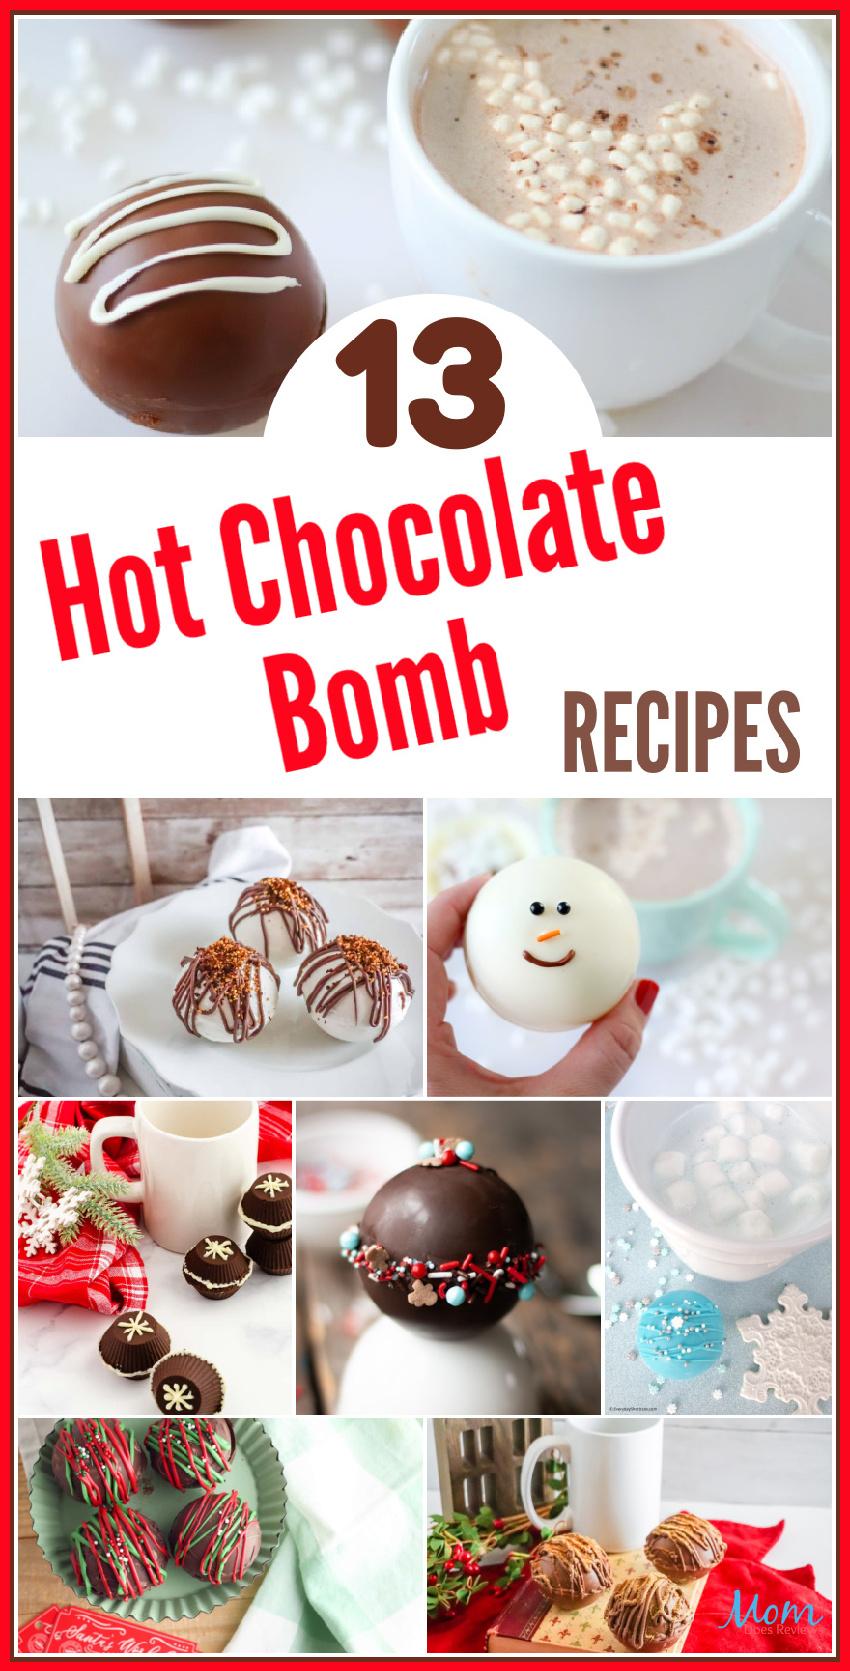 13 Hot Chocolate Bomb Recipes You NEED To Try Today #Hotcocoabombs #hotchocolate #chocolatelove